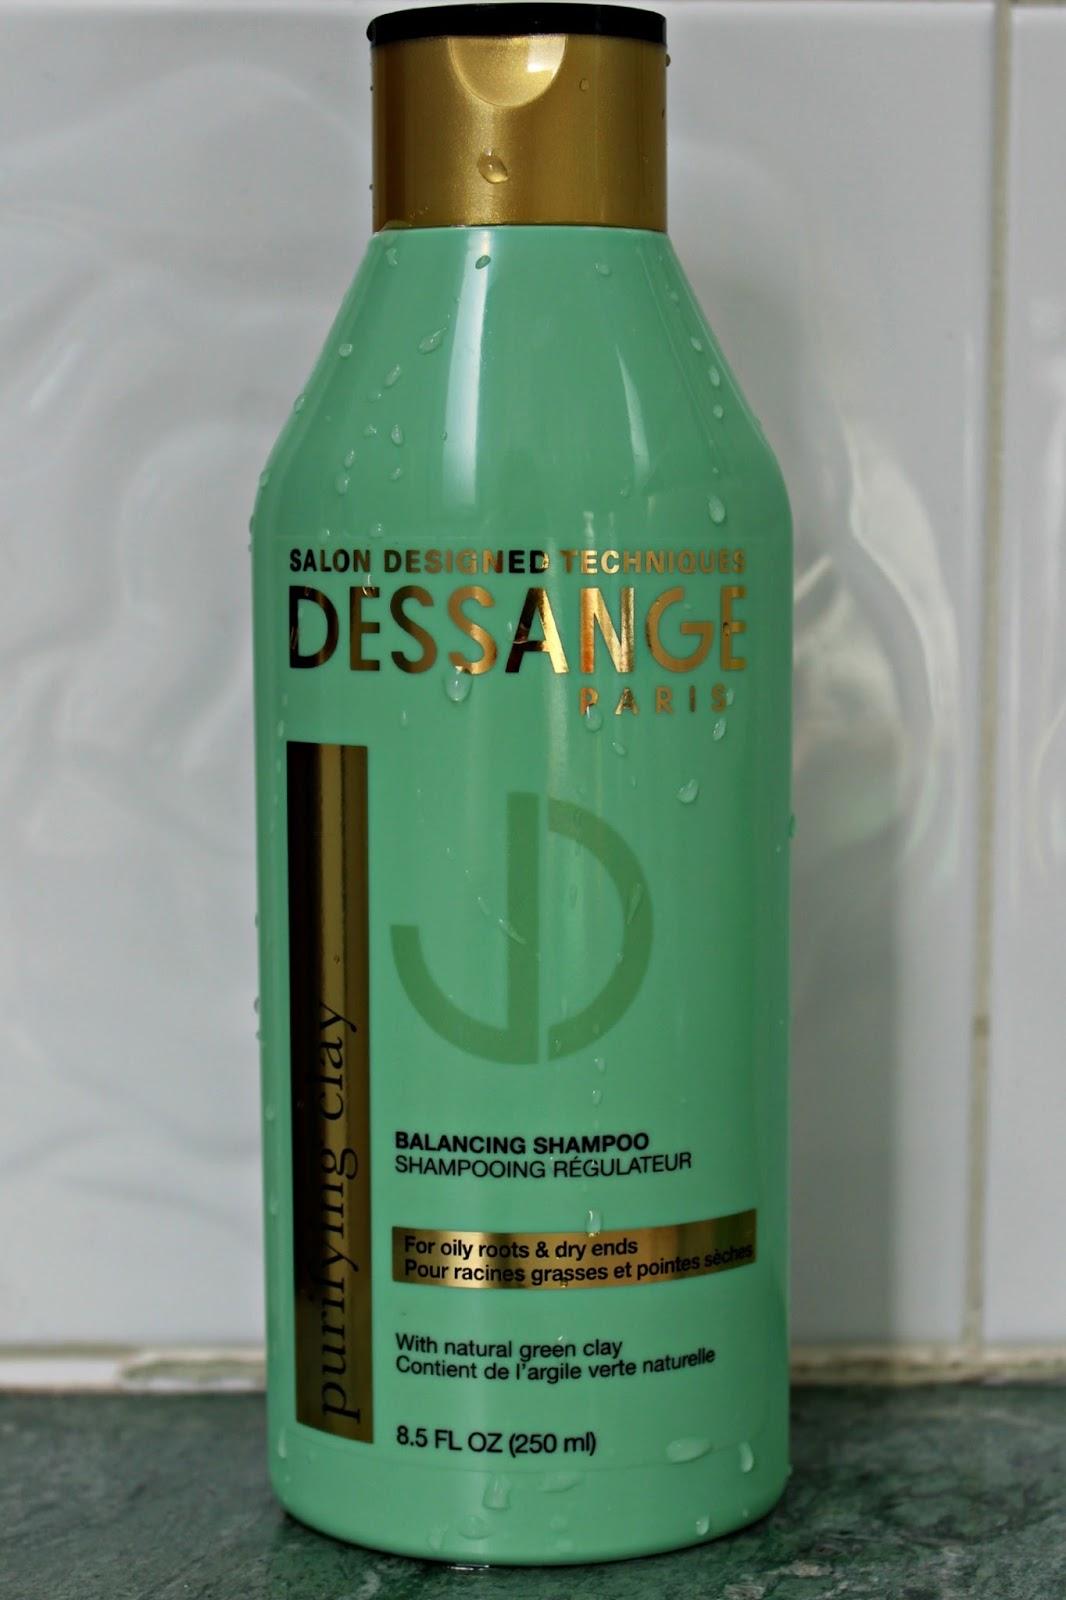 dessange paris shampoo